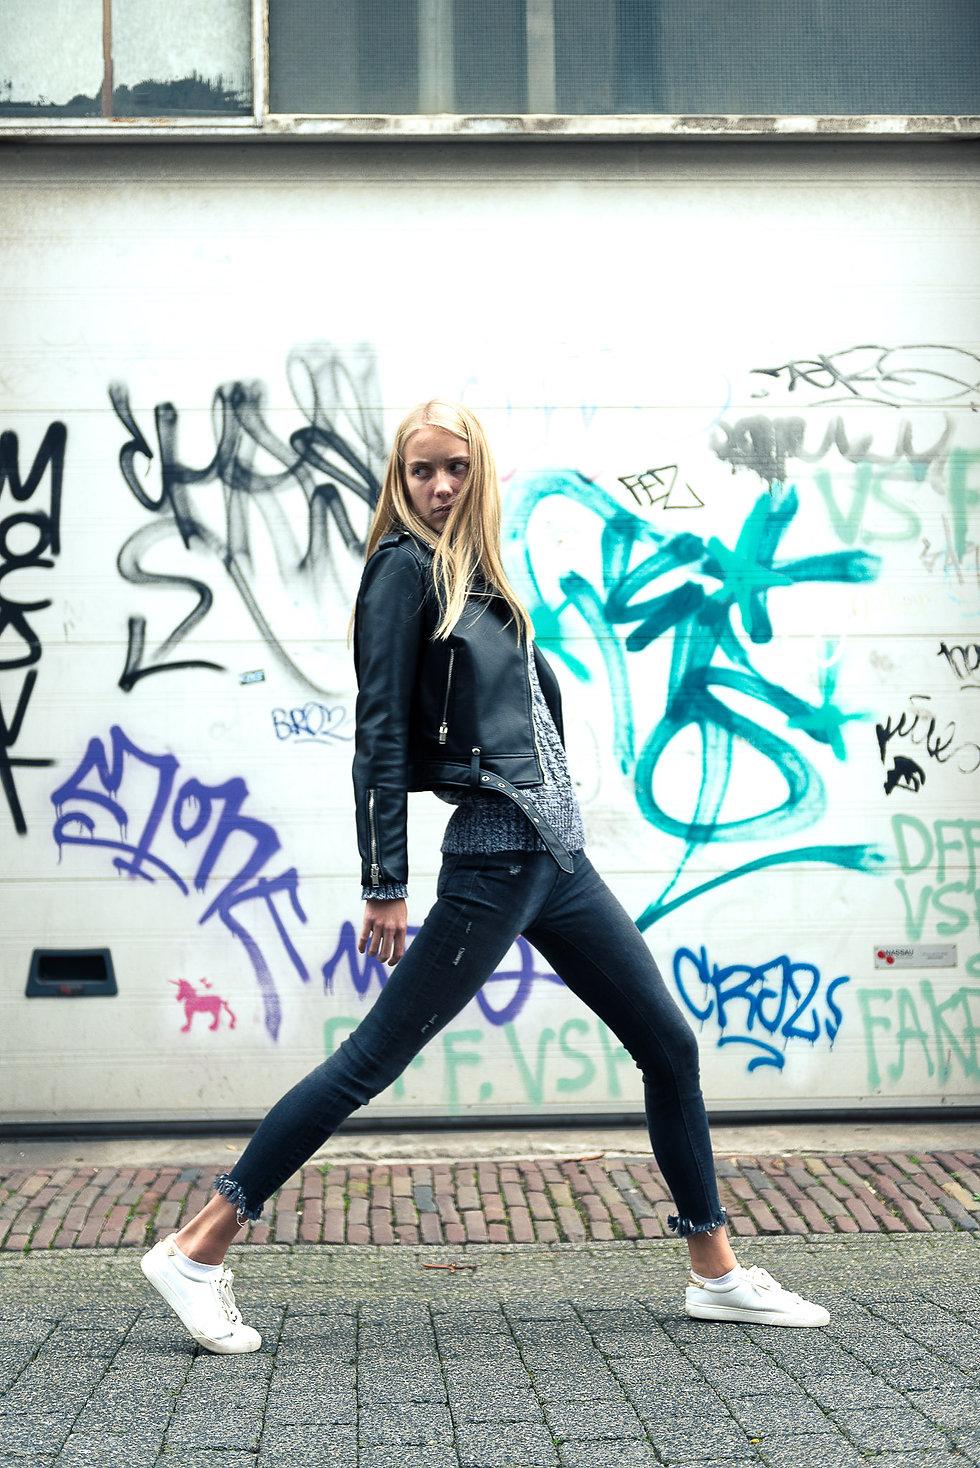 Dorine - WKD Models GoSee